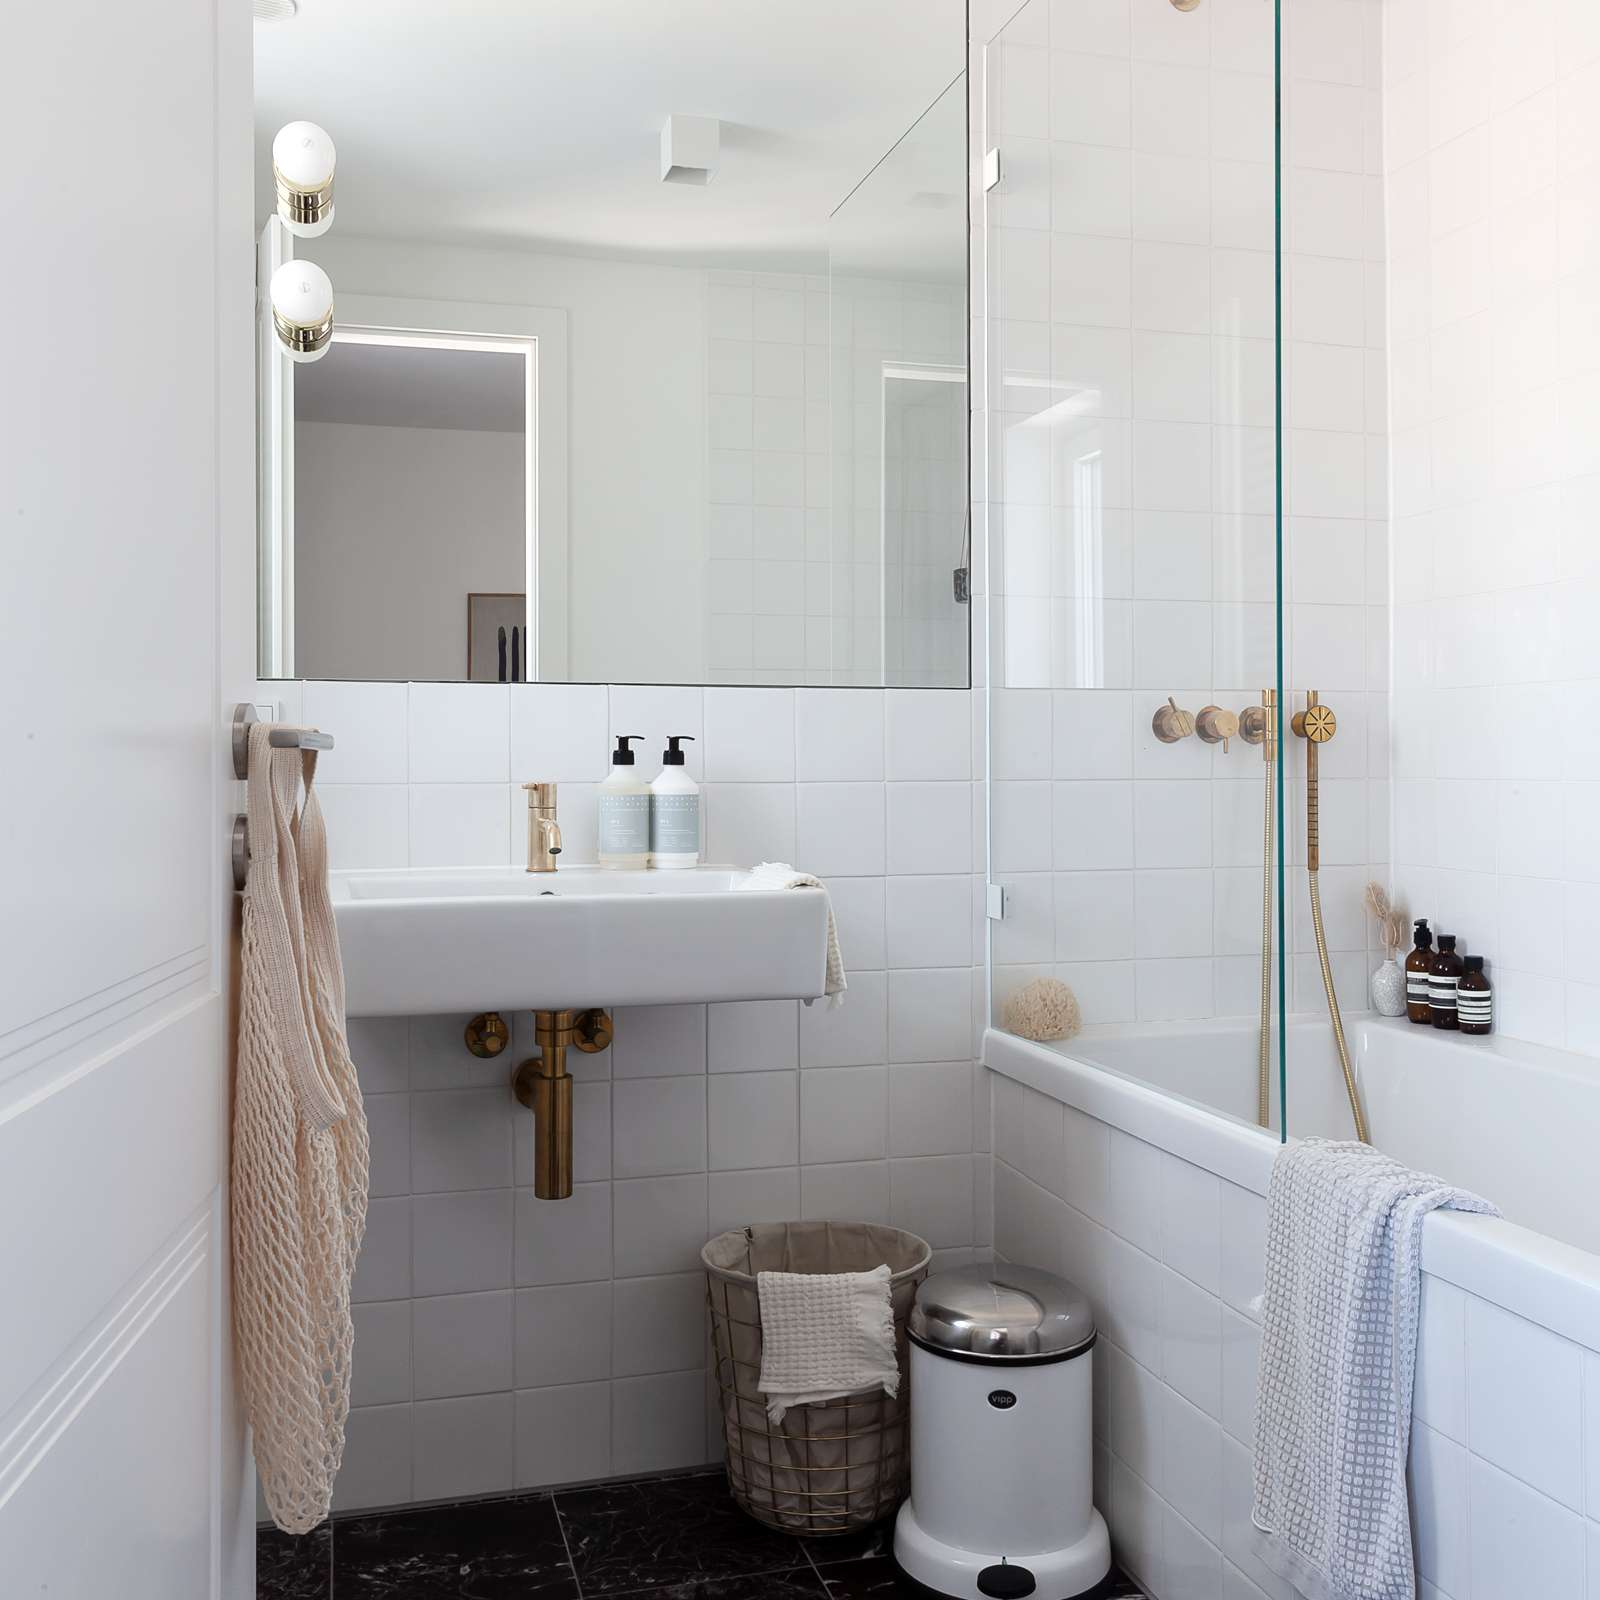 White bathroom with marble floor